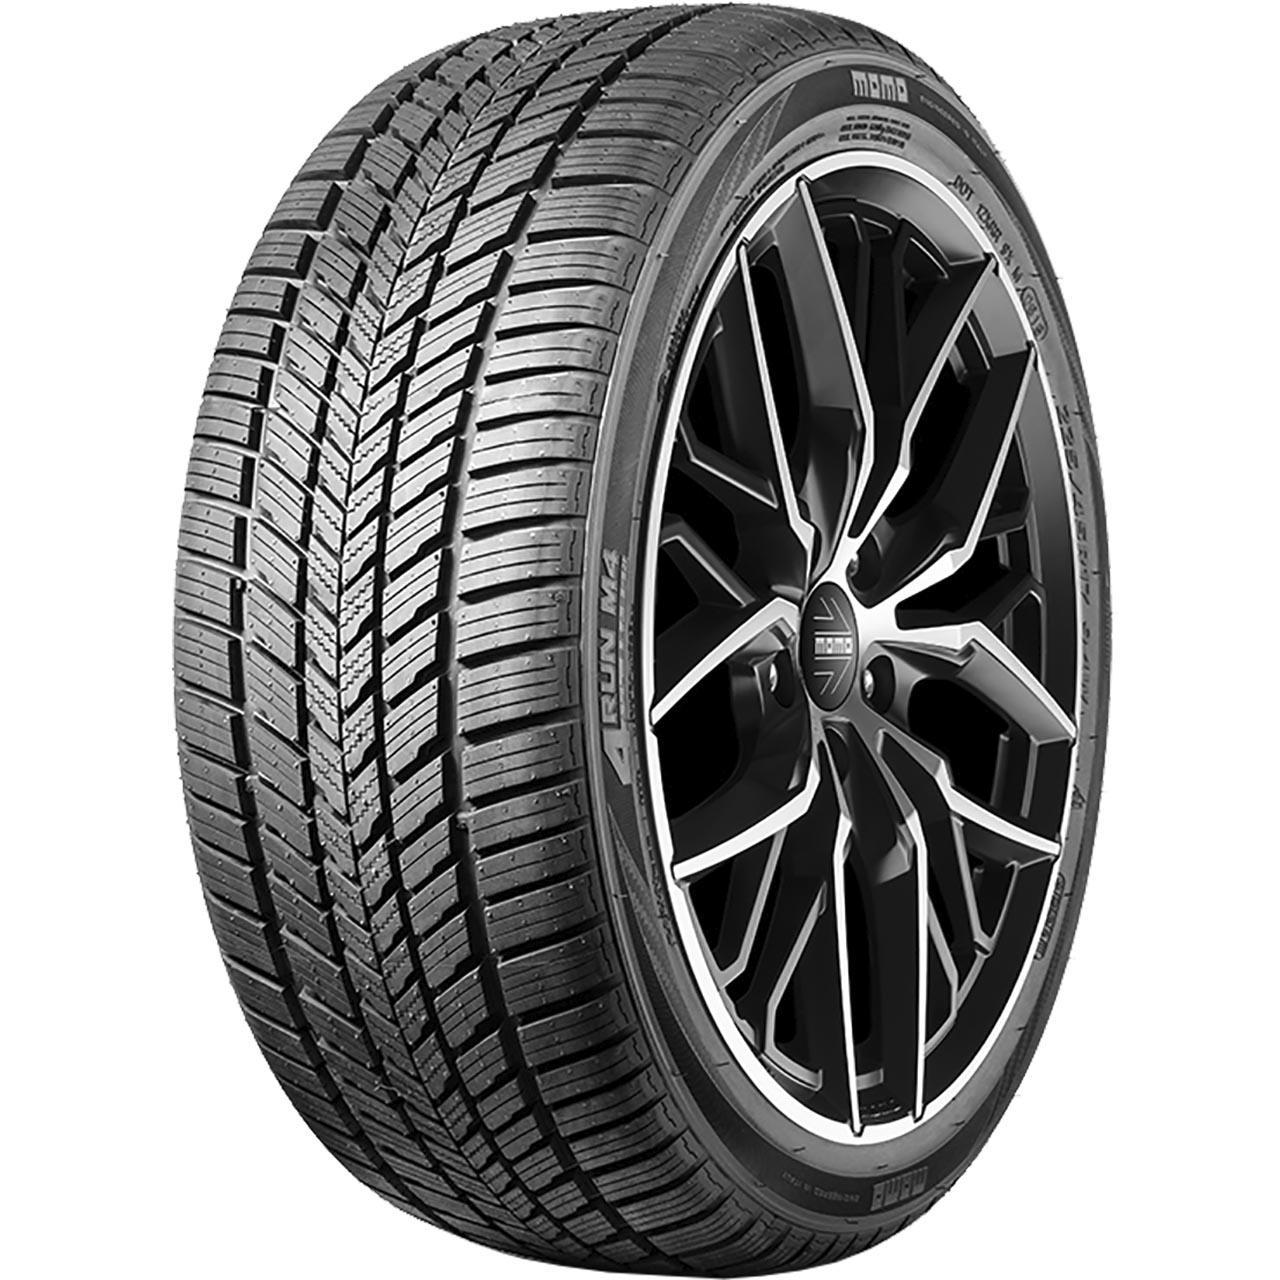 Momo Tire M 4 Four Season 195/65R15 95H XL